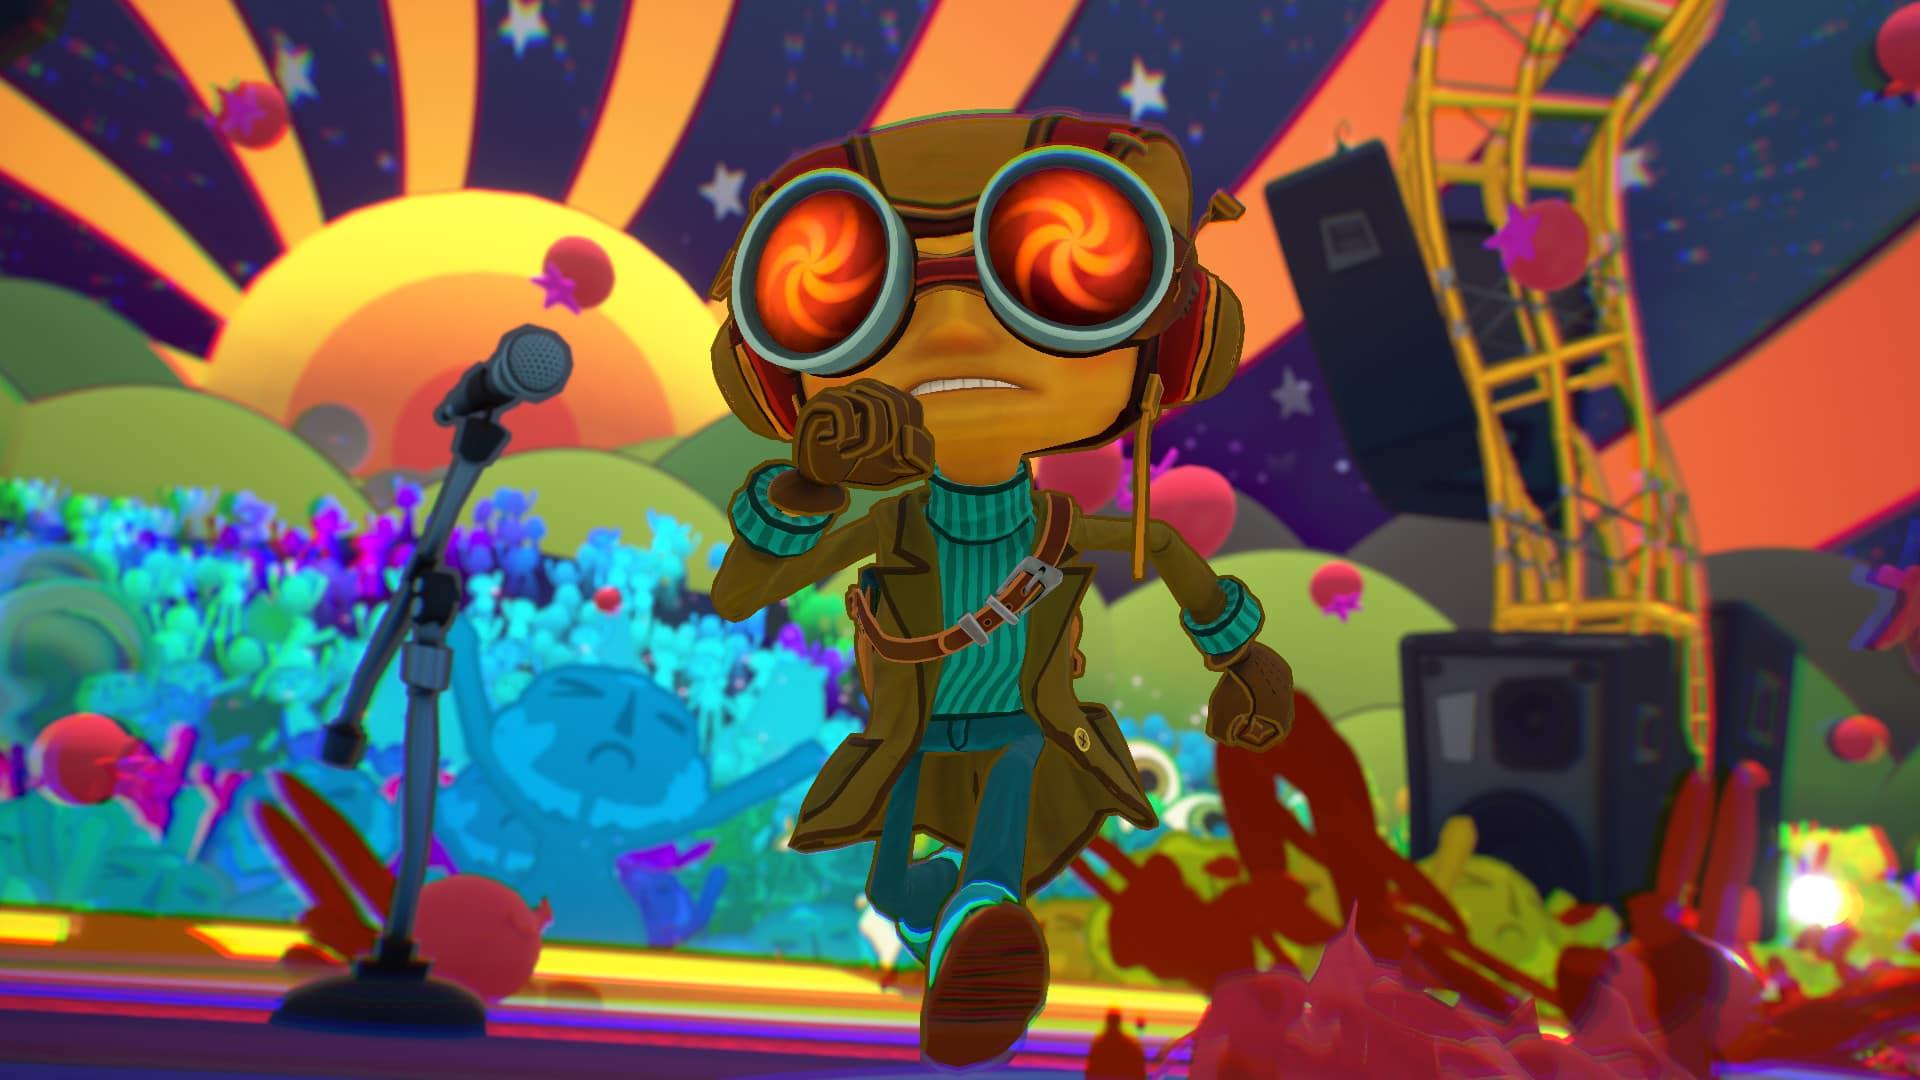 Psychonauts 2 Double Fine Productions Psi-King Sensorium masterwork masterpiece game design new narrative Psi-King's